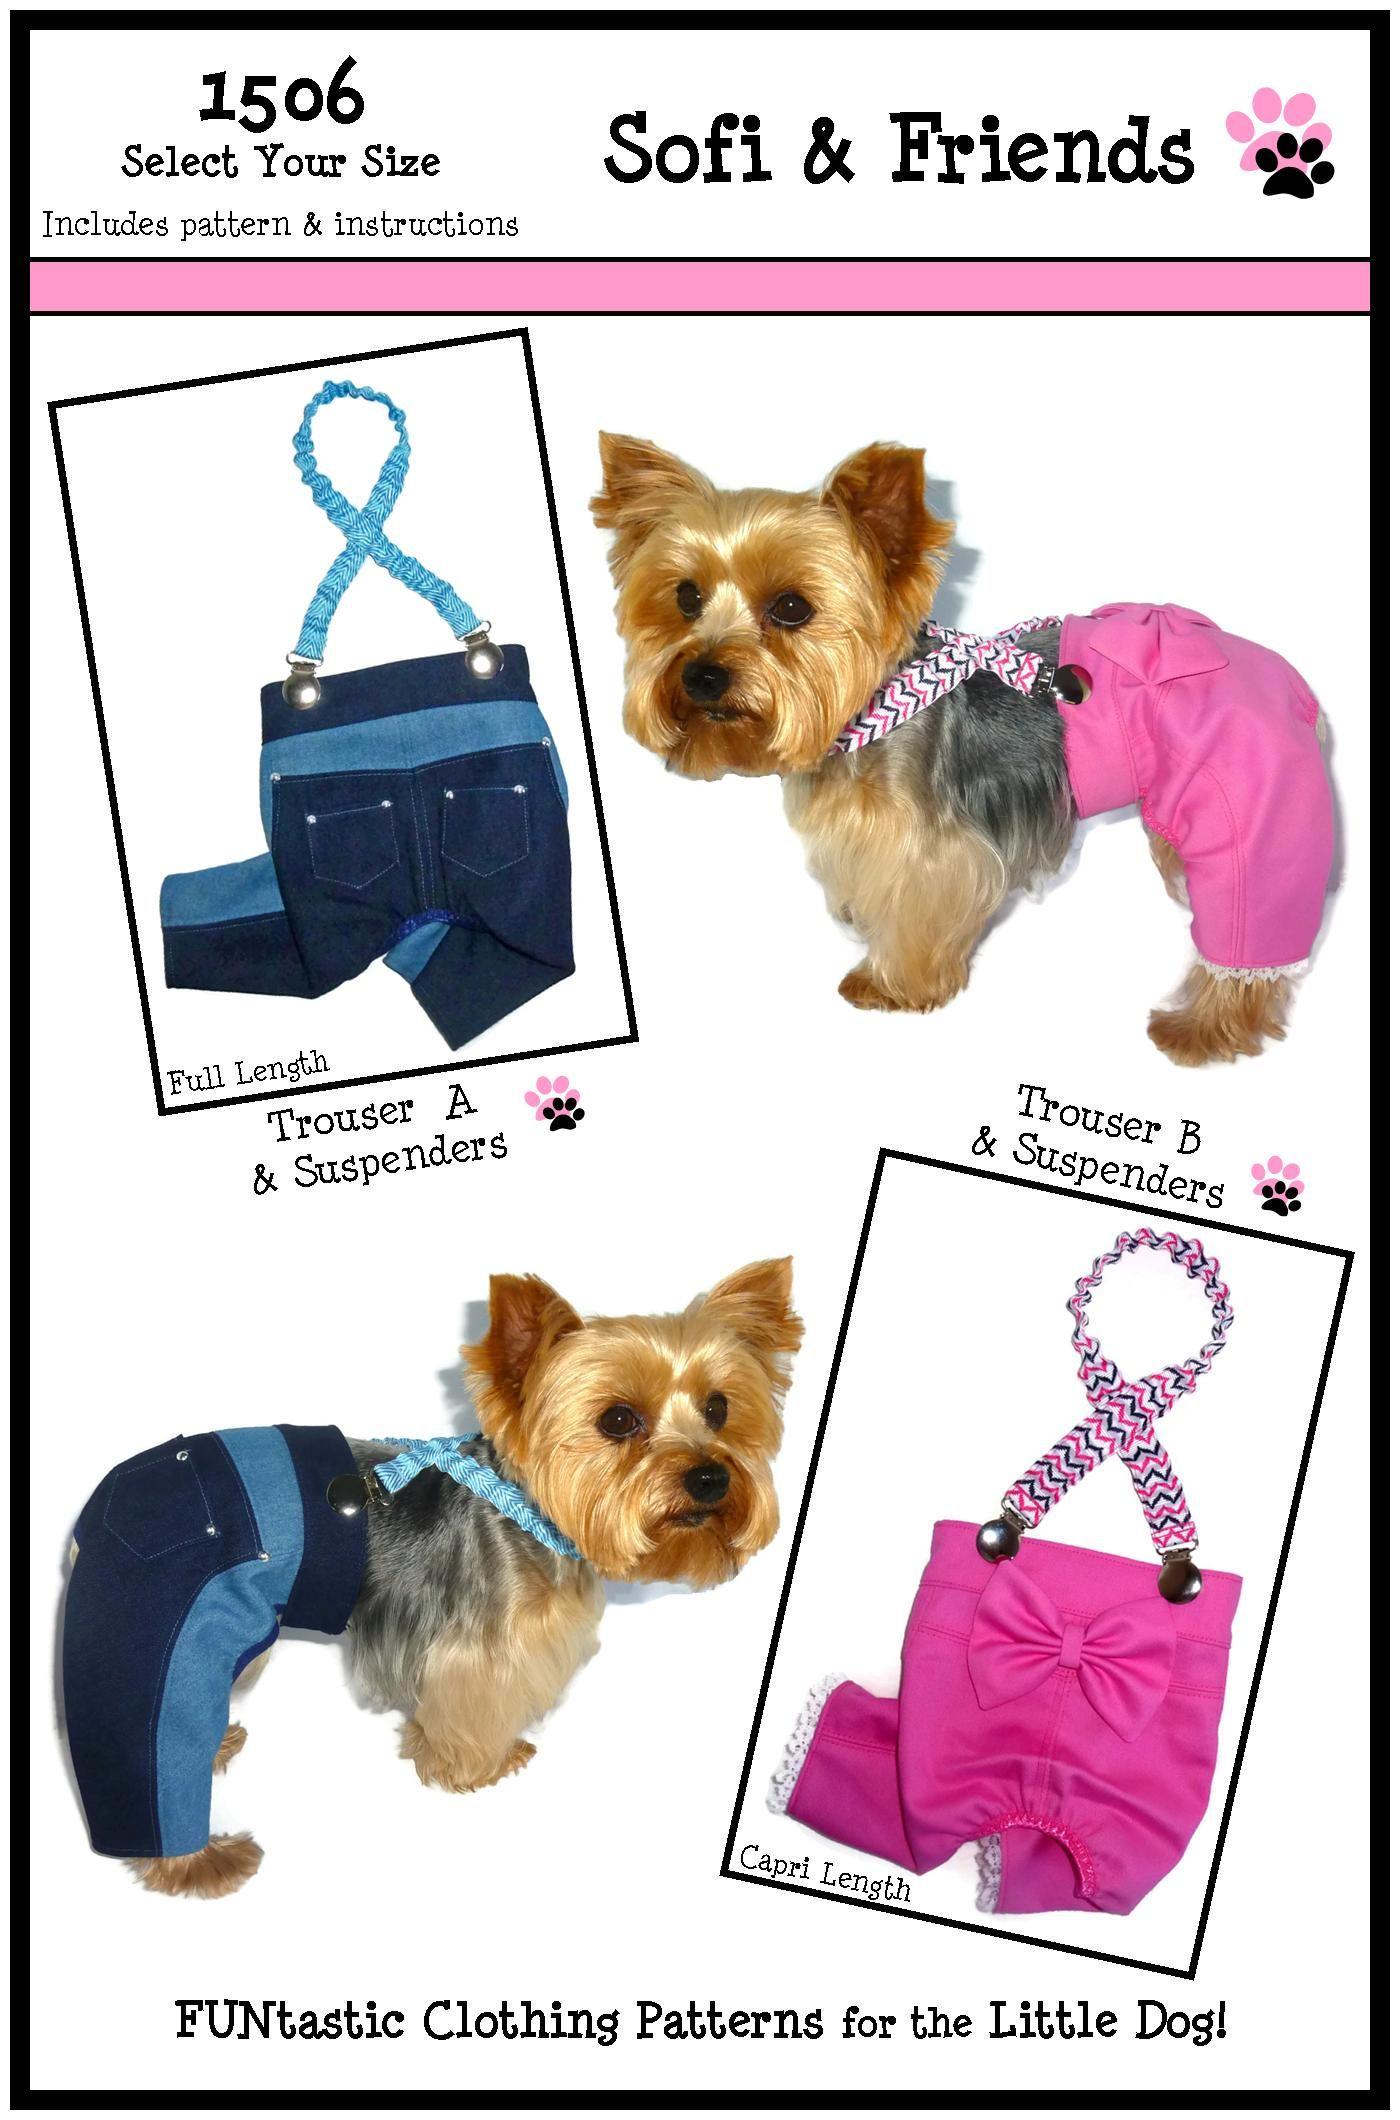 Dog jeans pattern 1506 bundle 3 sizes dog clothes pattern dog clothes sewing pattern 1506 trouser suspenders for the little dog 825 jeuxipadfo Image collections